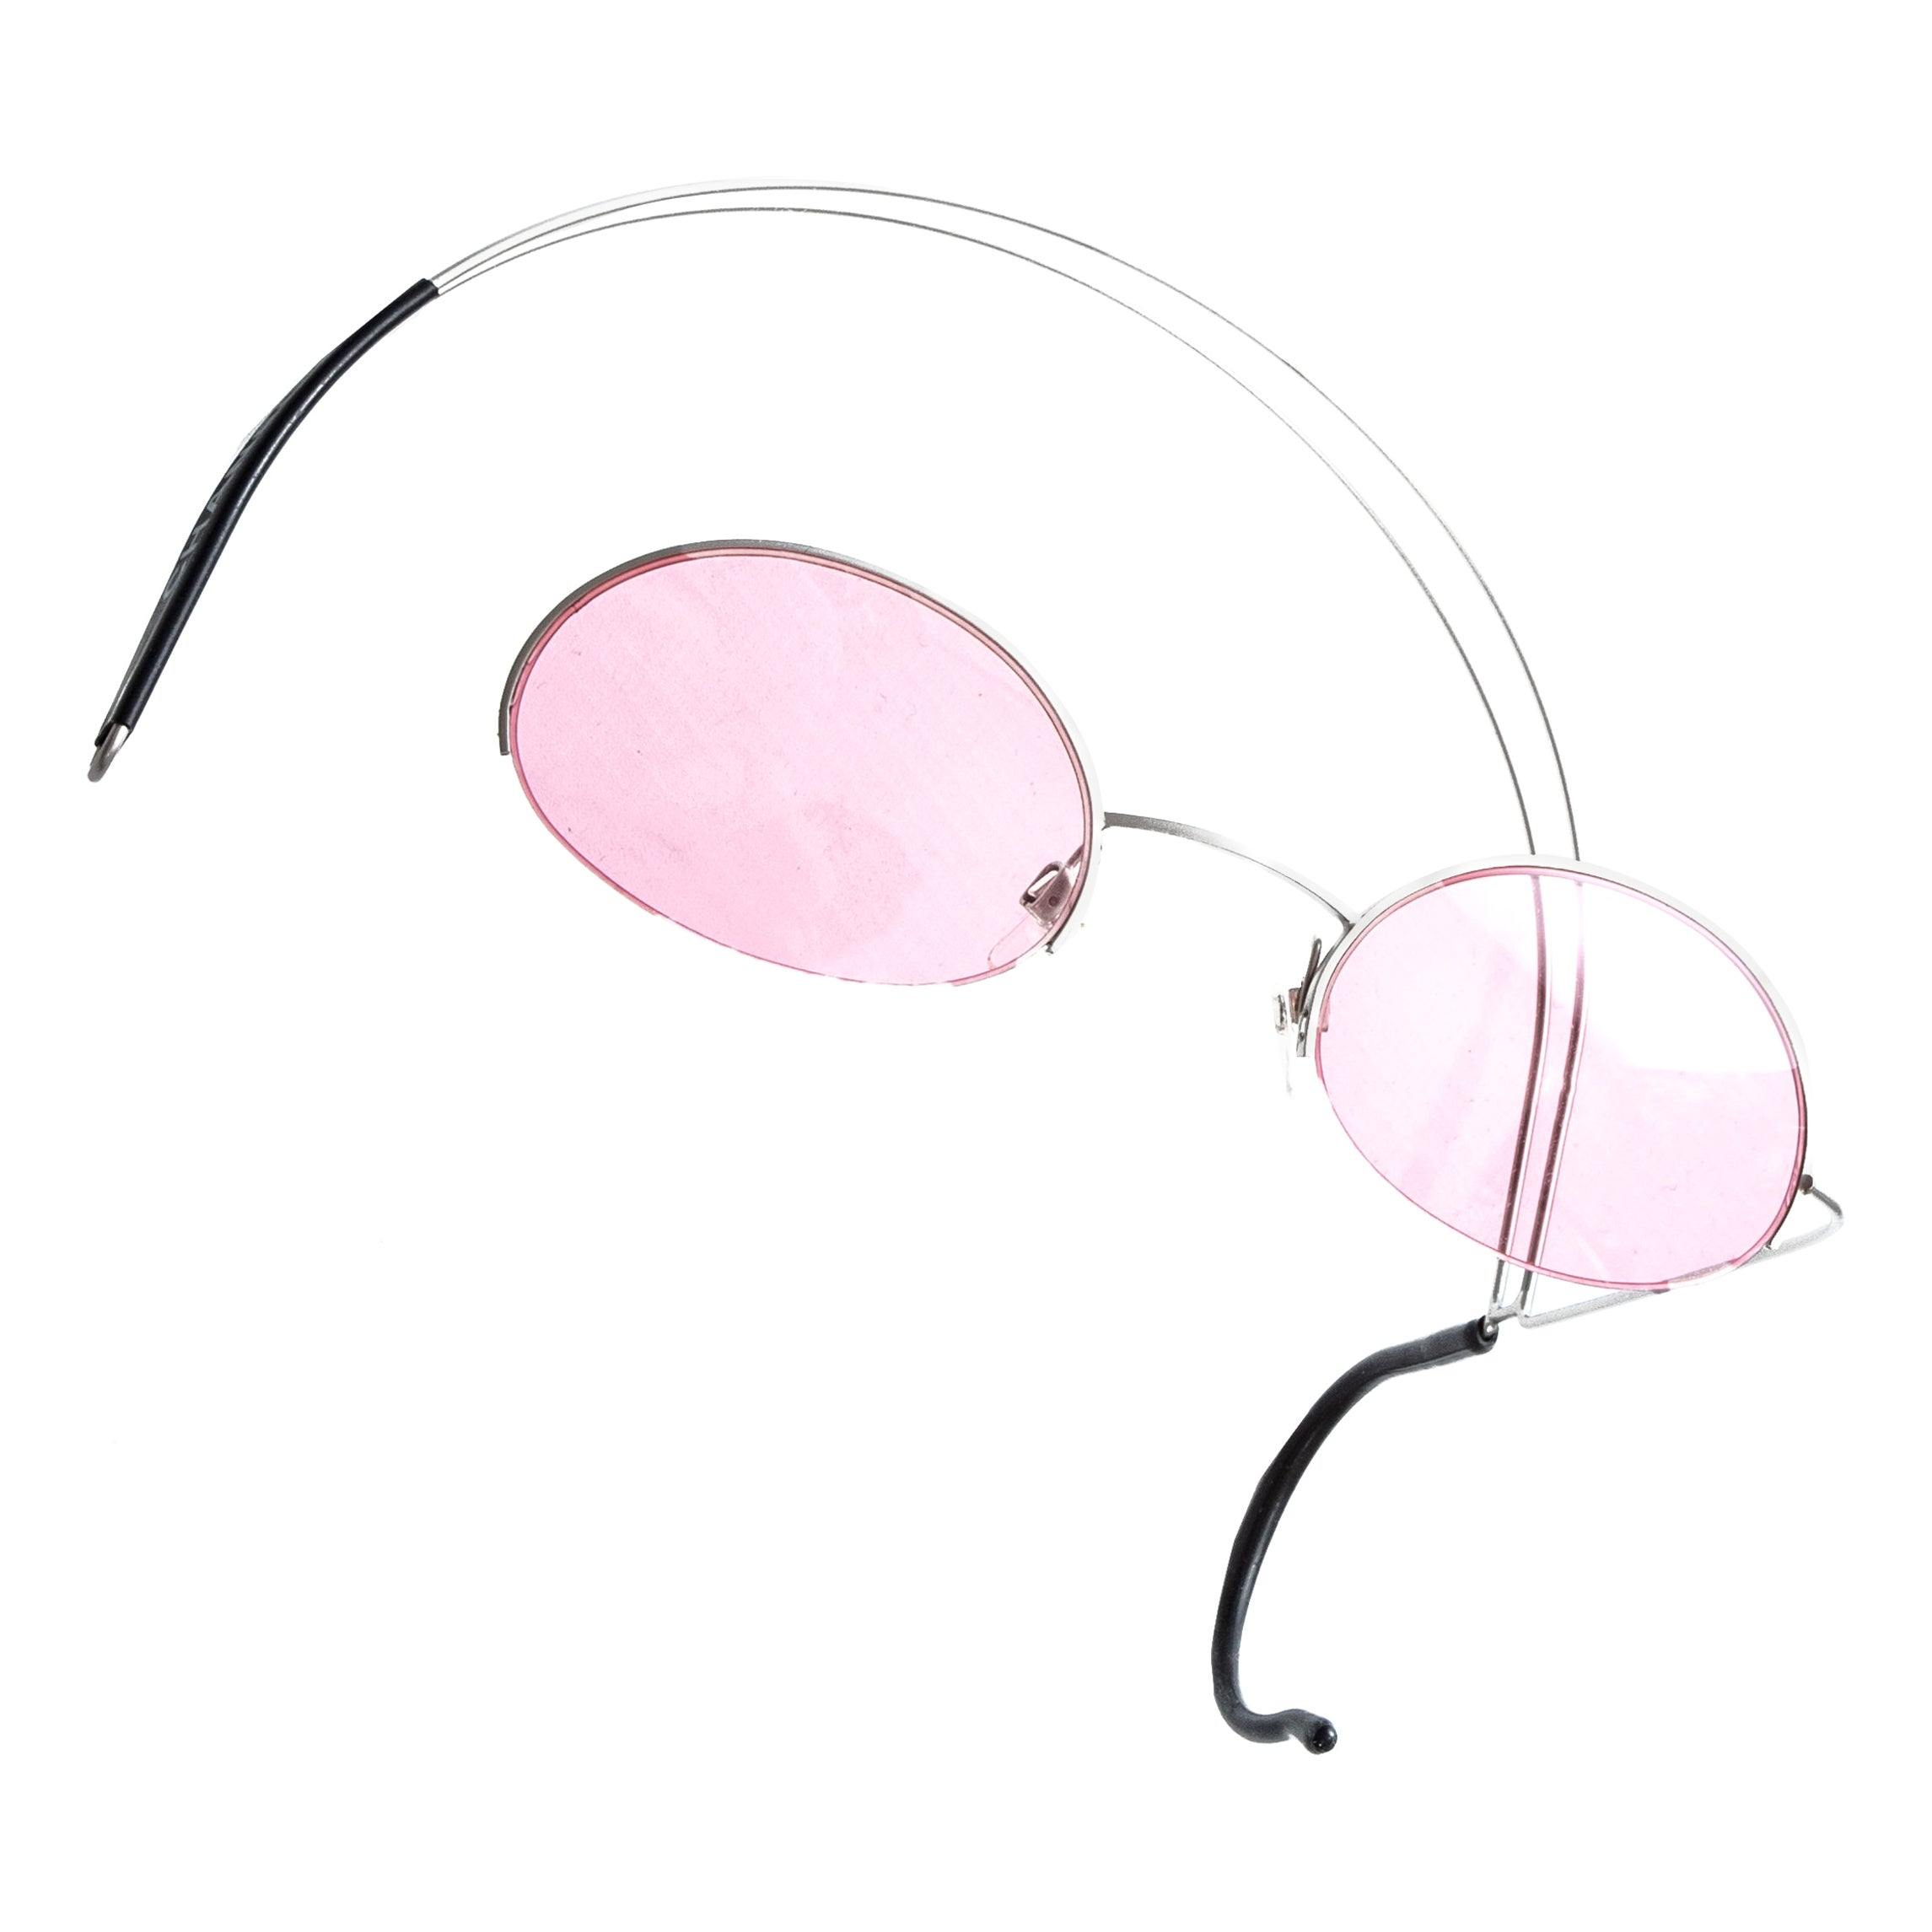 Chanel pink wire headband sunglasses, ss 1999